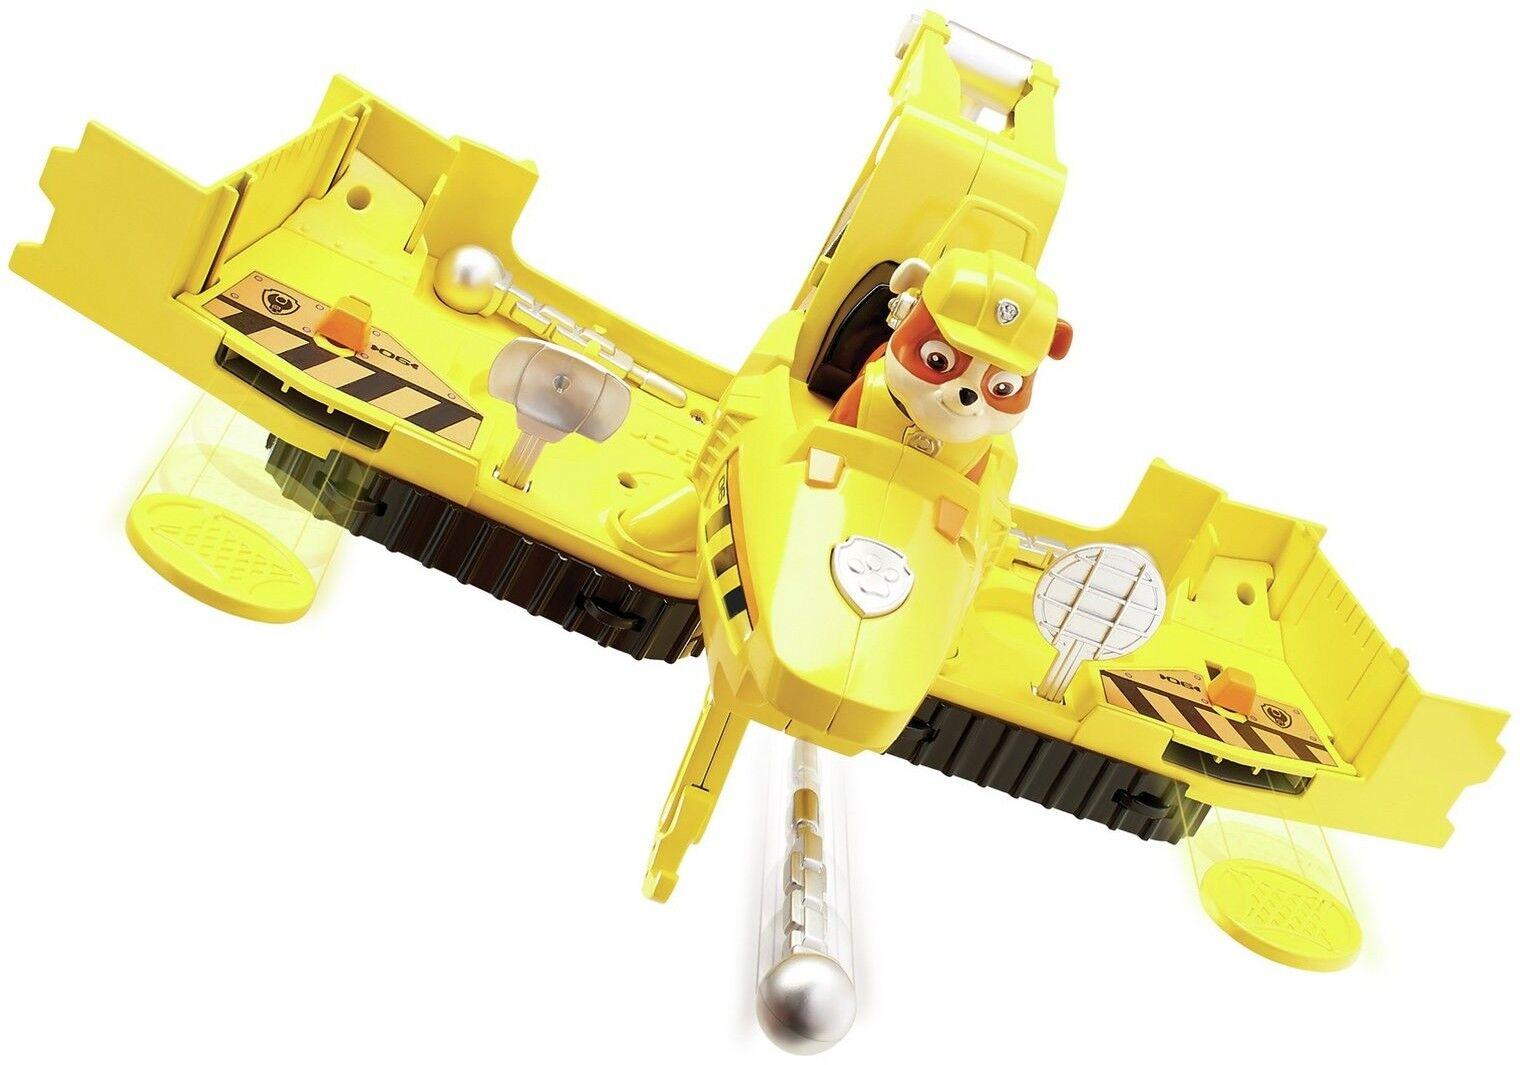 Barnpatrull Rubble Flip and flygaga fordon